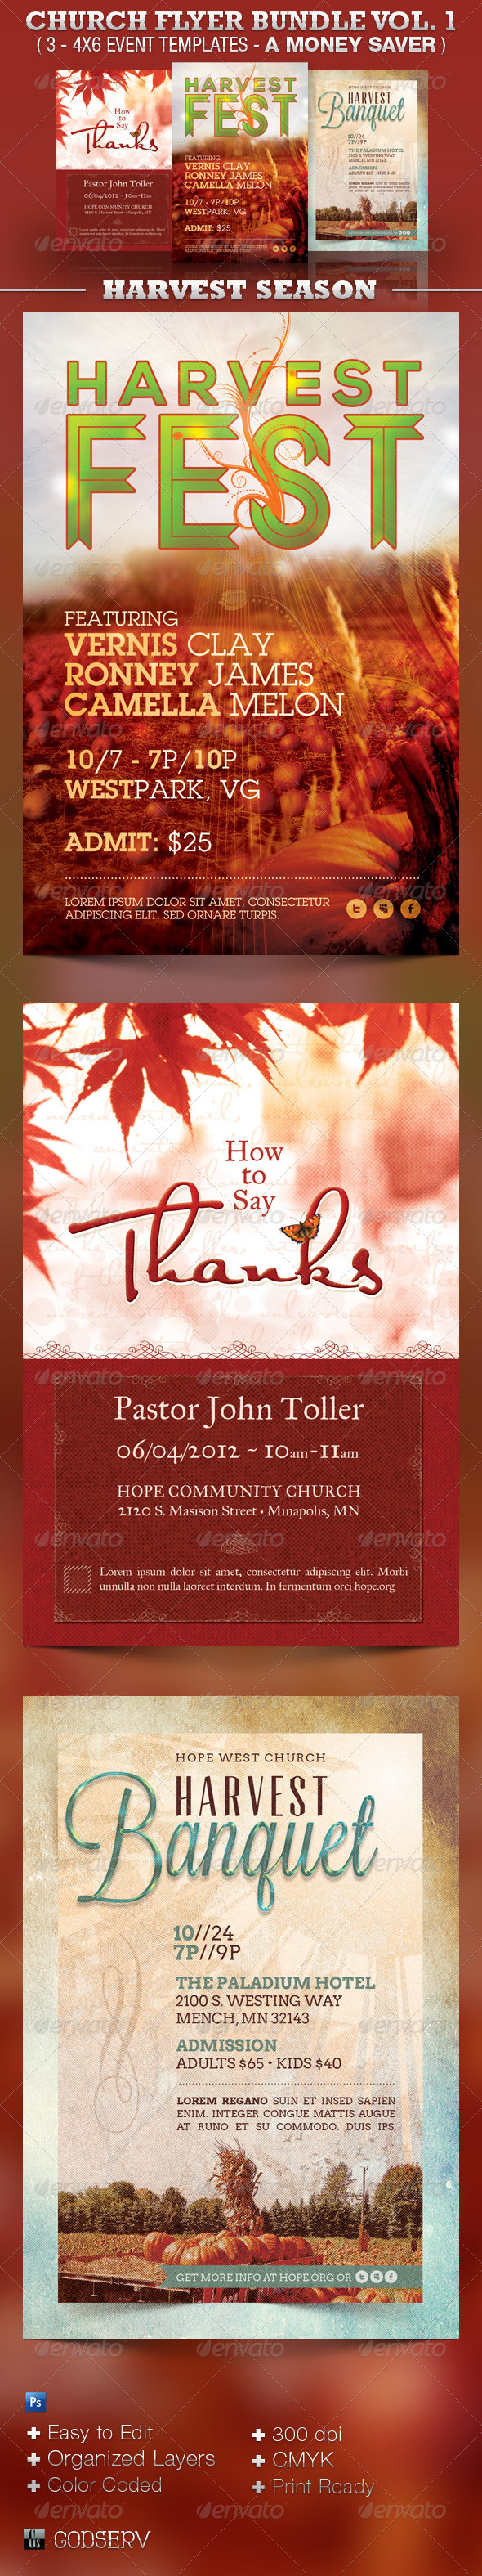 Harvest Church Flyer Template Bundle Vol 1 - Church Flyers